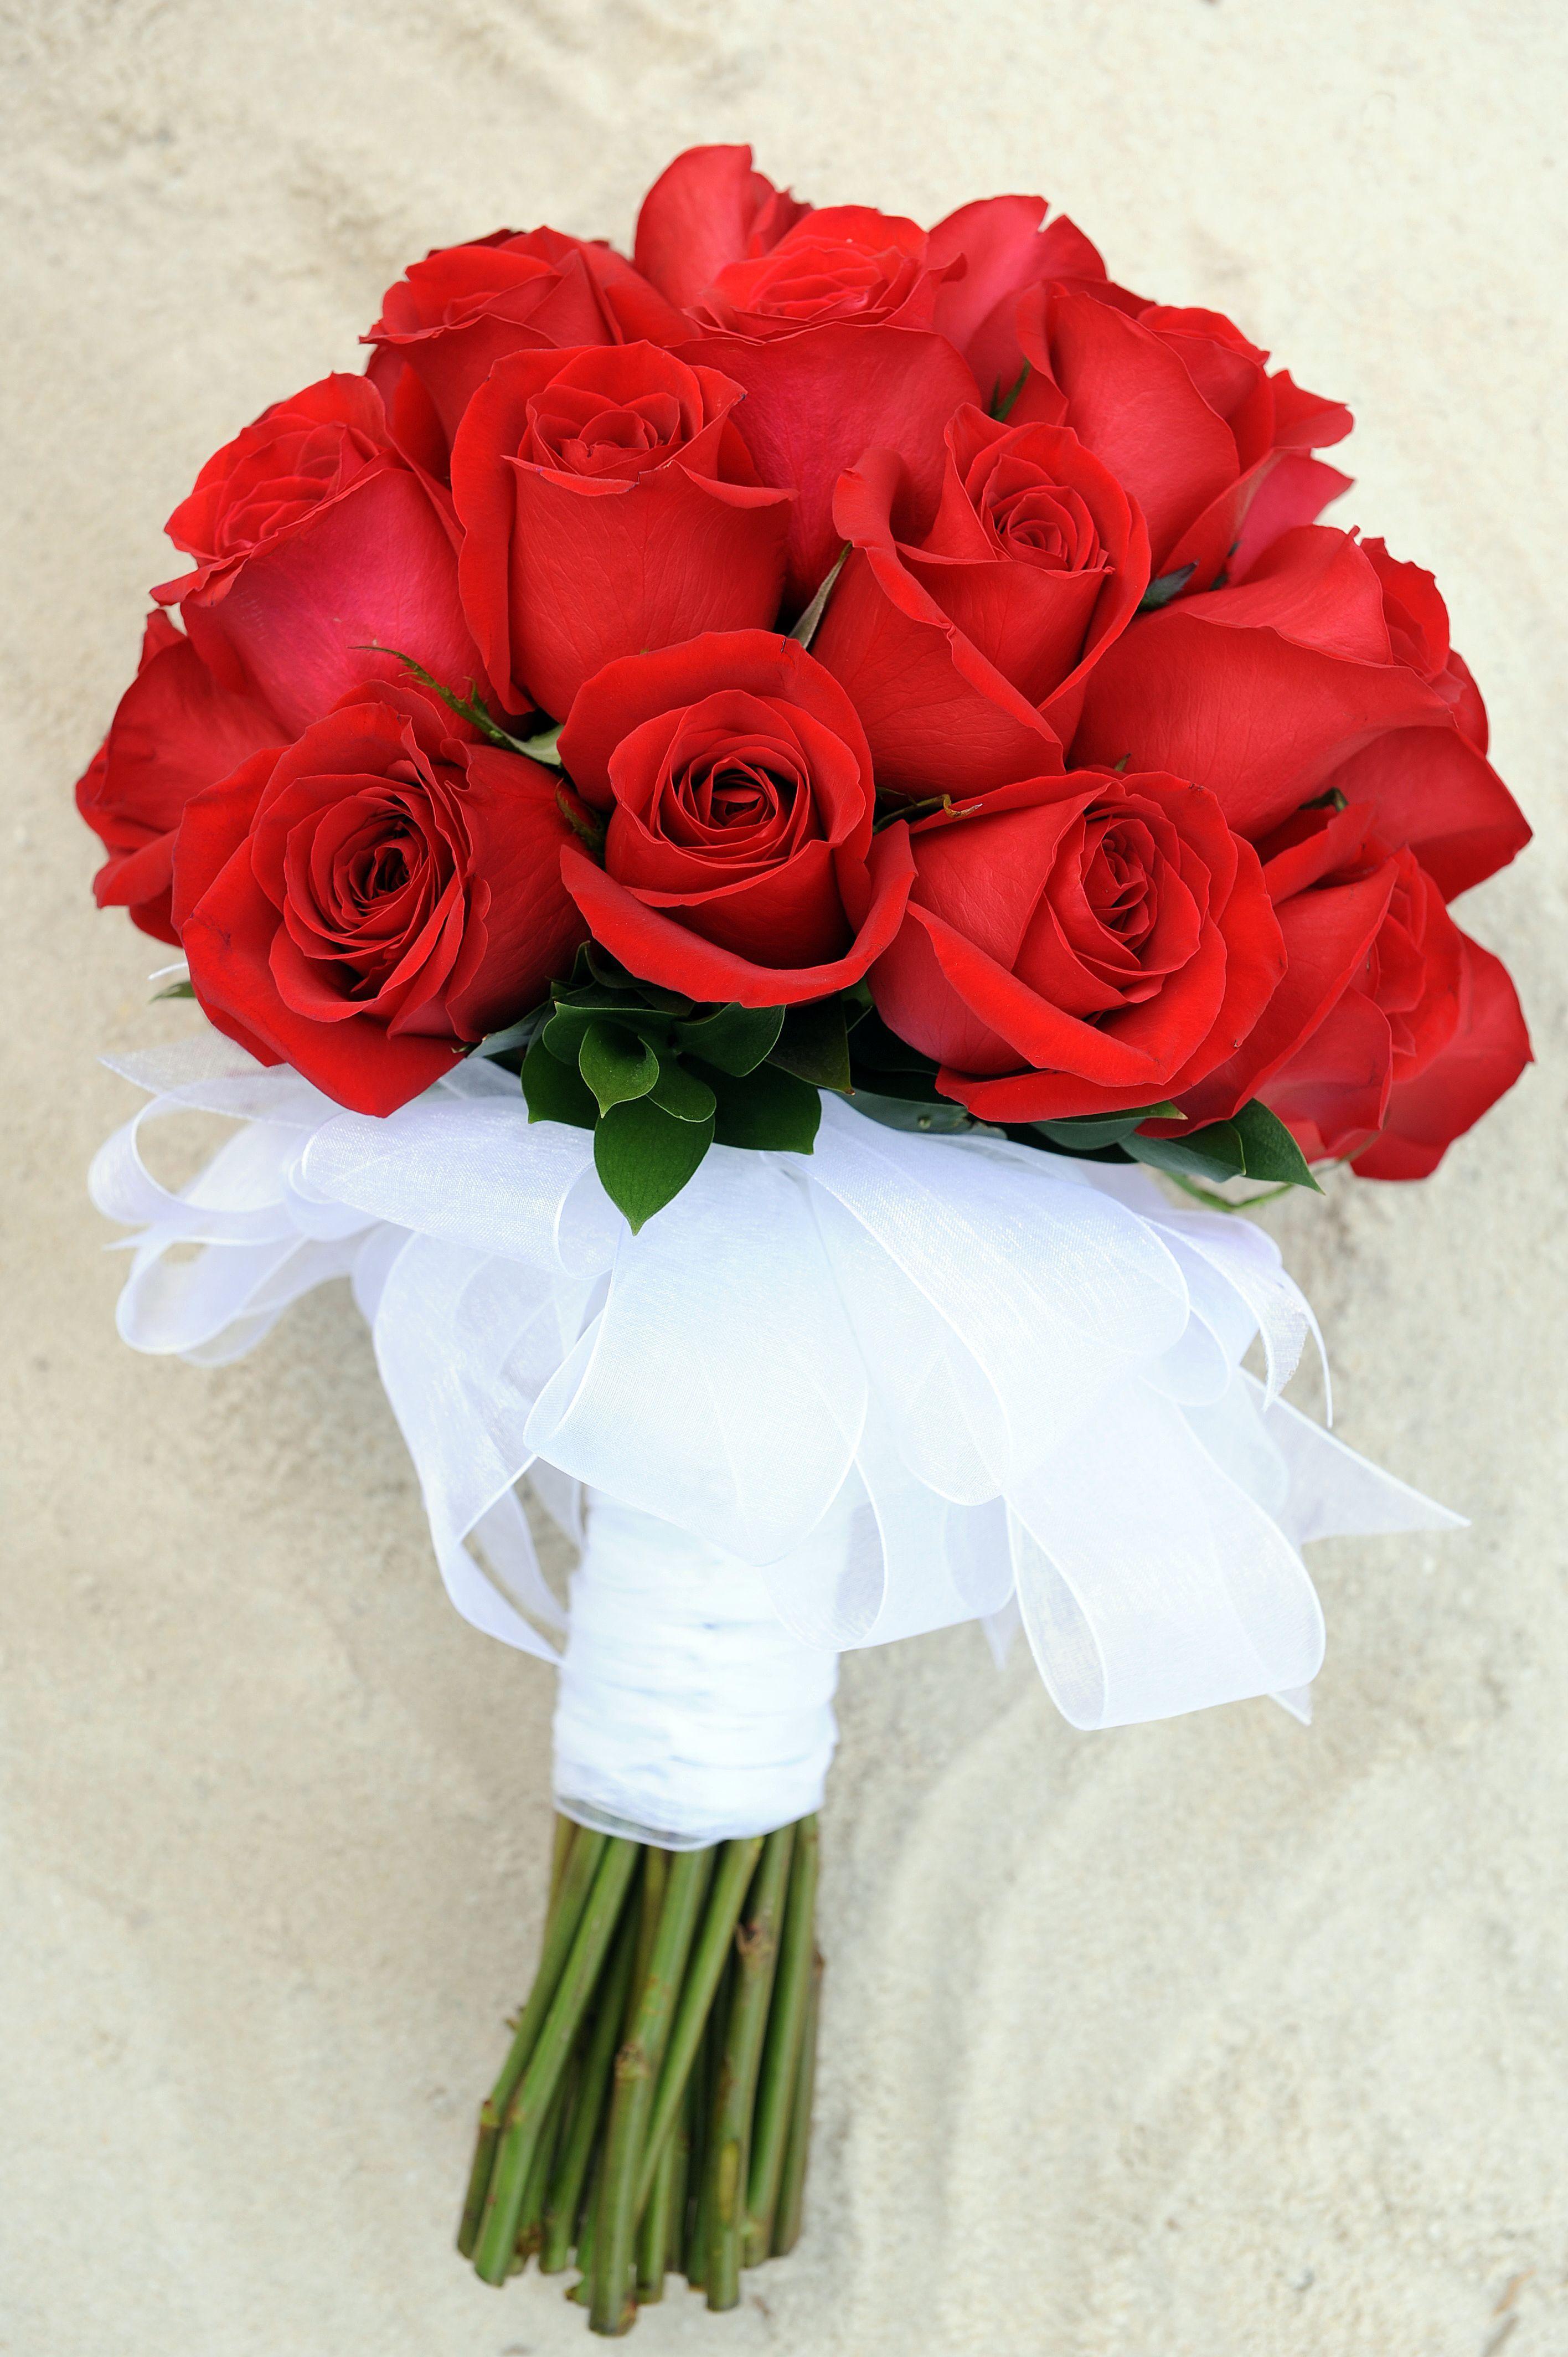 24 The Best Red Rose Bouquet Ideas Weddingtopia Red Rose Bouquet Red Bouquet Wedding Rose Wedding Bouquet